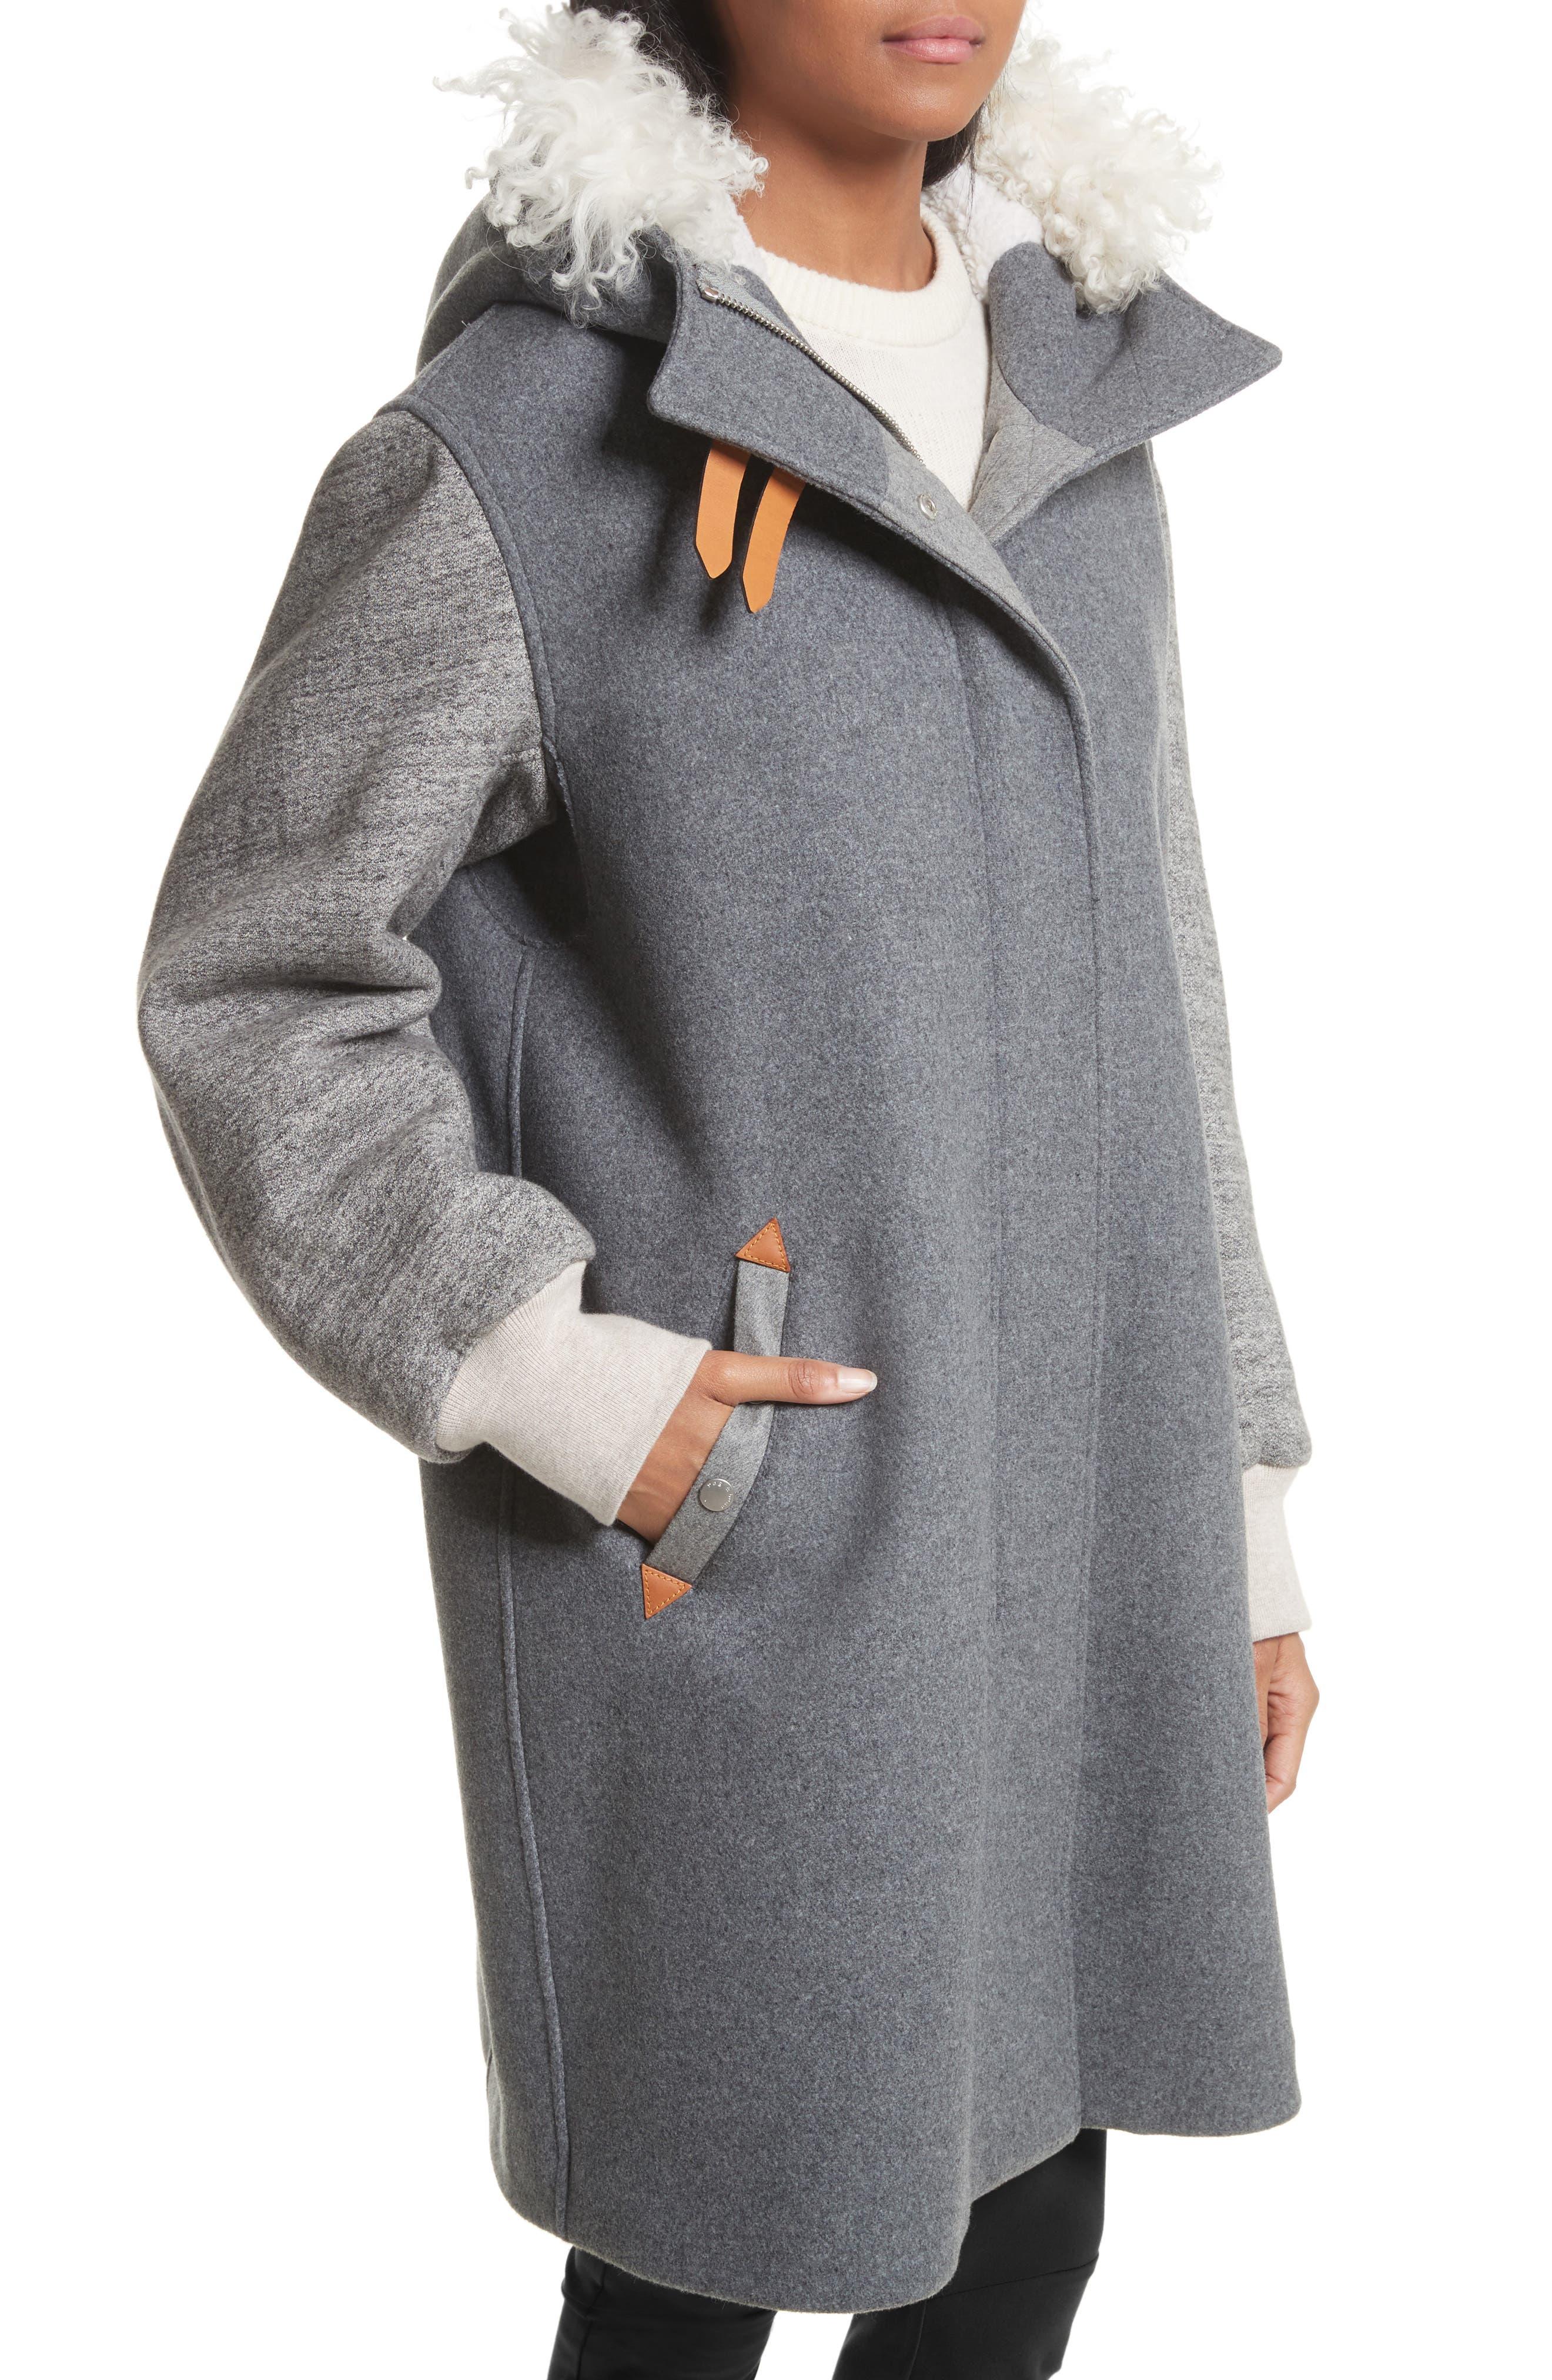 Laporta Genuine Shearling Trim Wool Blend Hooded Coat,                             Alternate thumbnail 5, color,                             Dark Grey